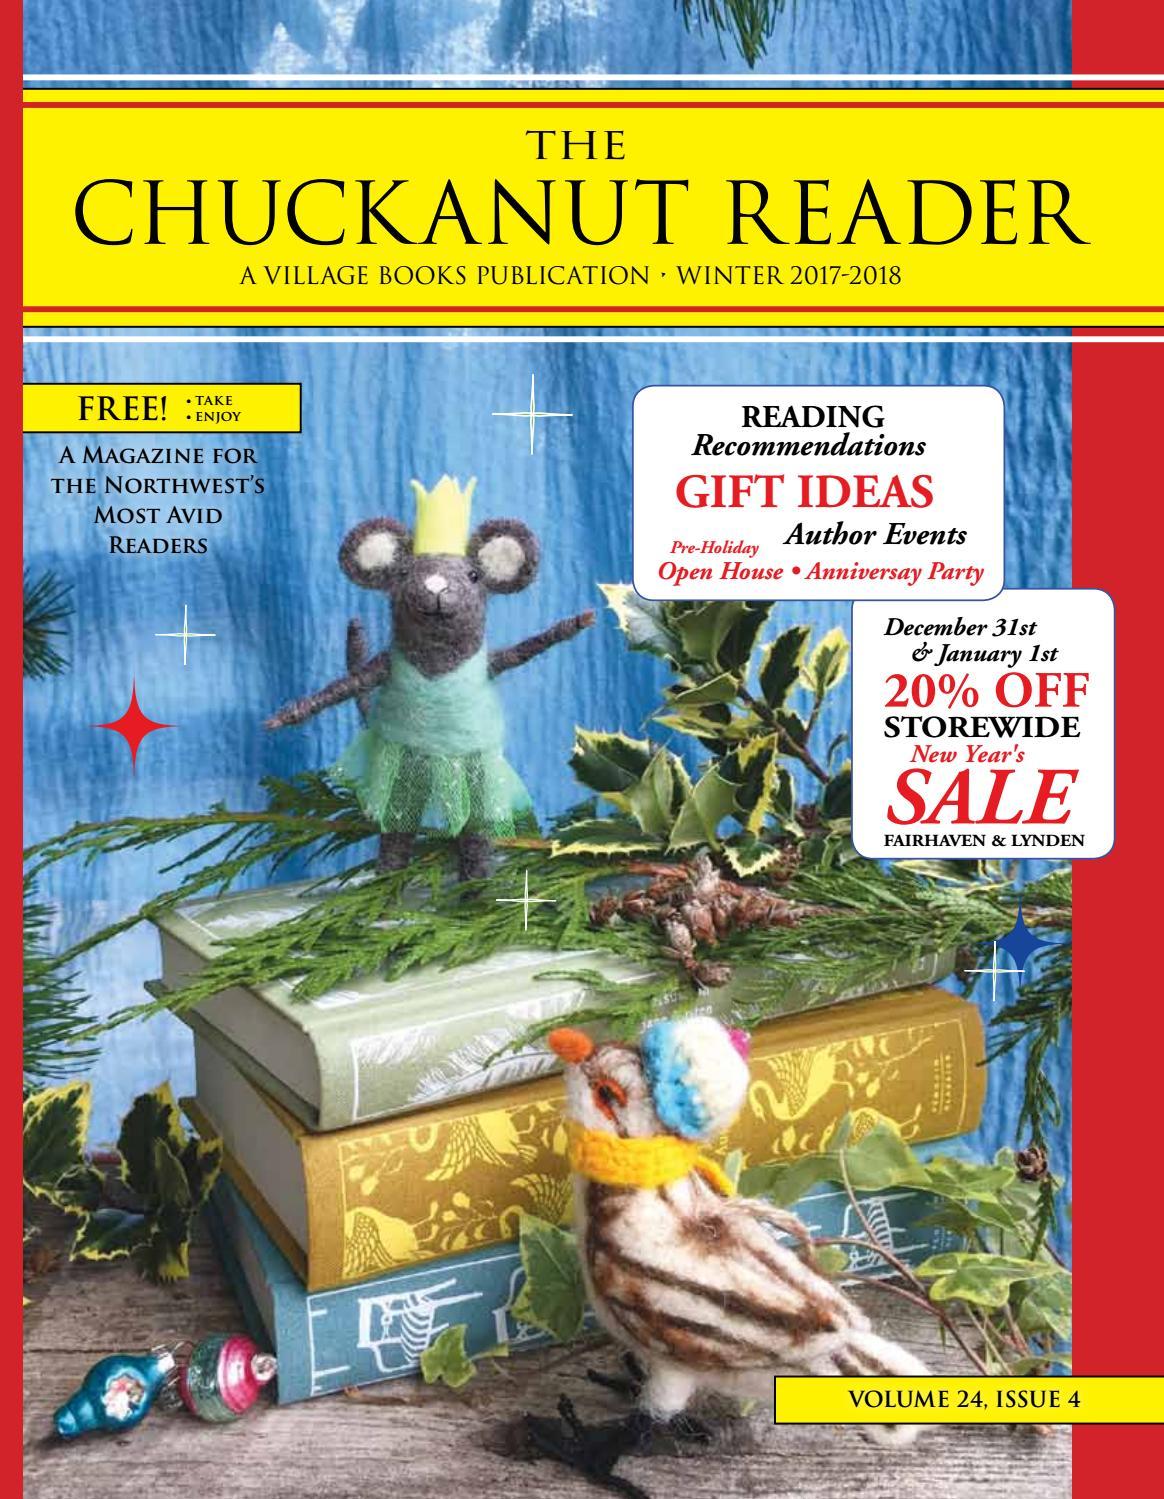 Chuckanut Reader - Winter 2017/2018 by Village Books & Paper Dreams - issuu